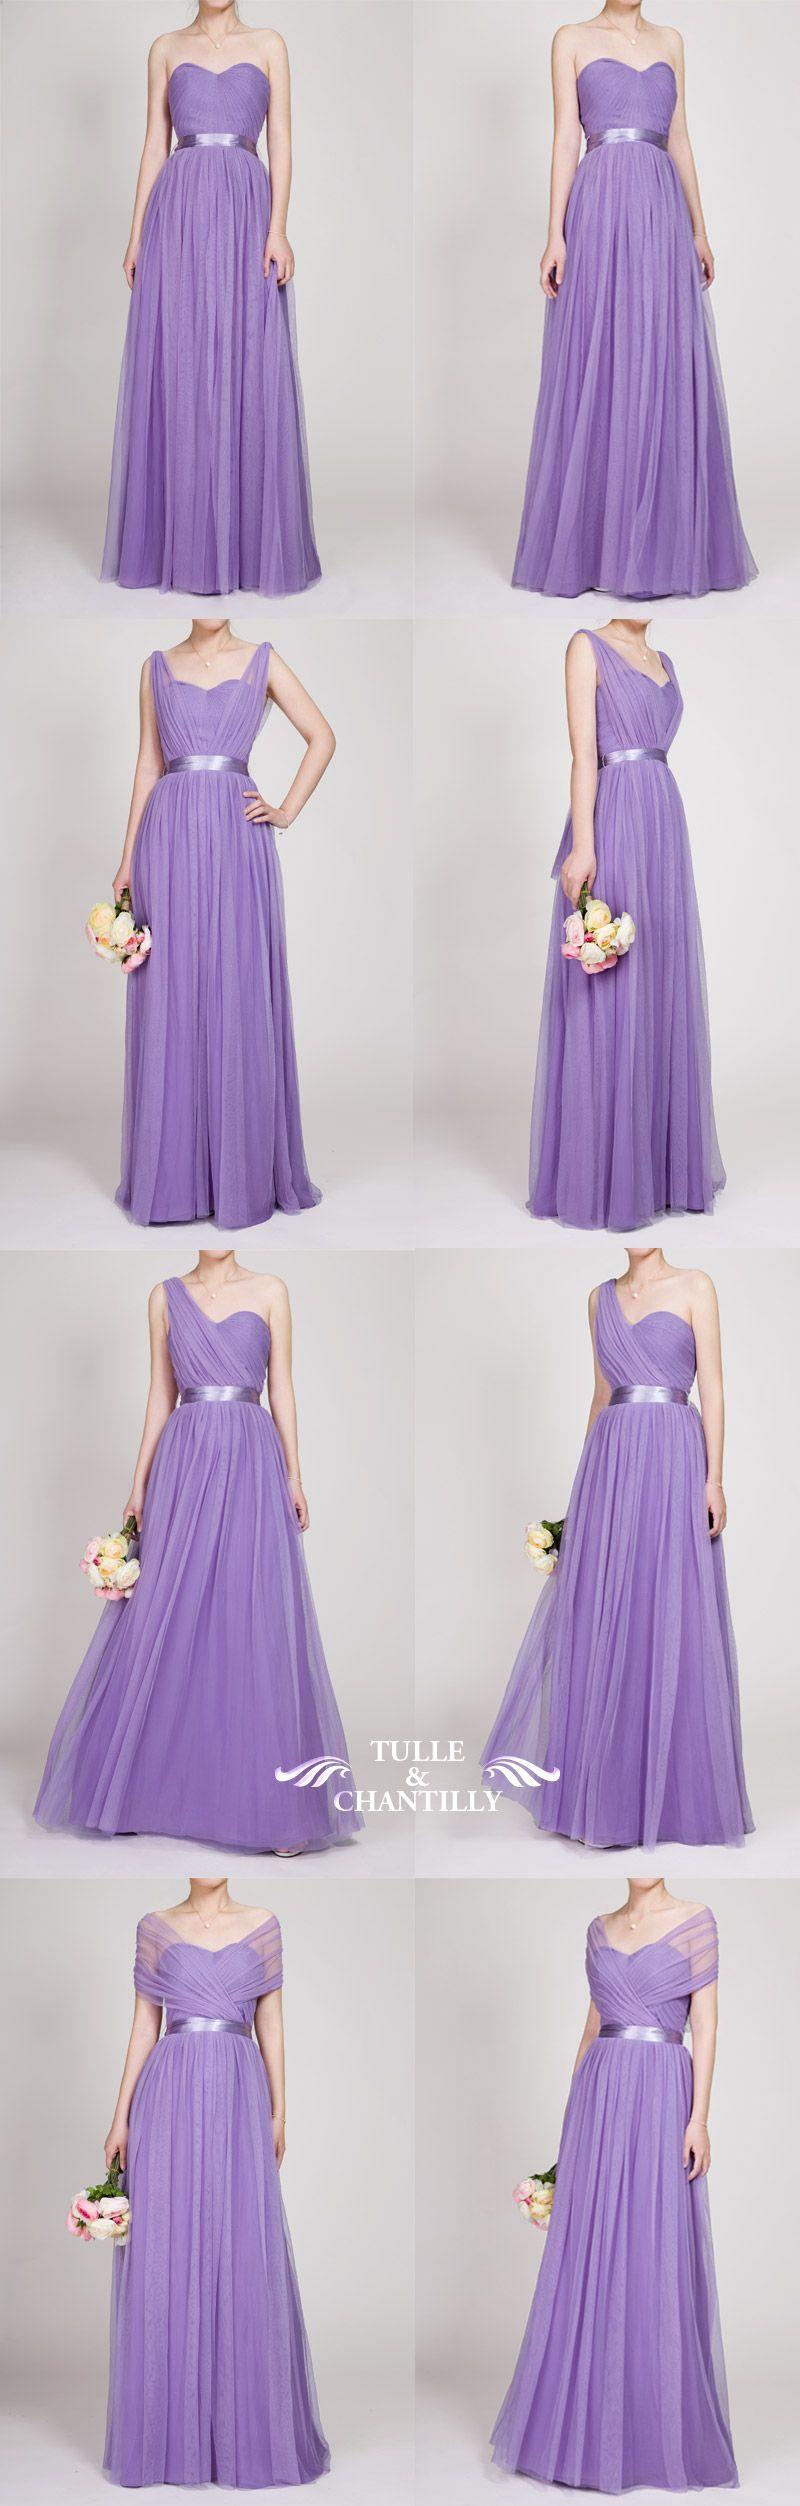 Tulle Convertible Multi-wear Bridesmaid Dress TBQP307 | Lilas, Damas ...